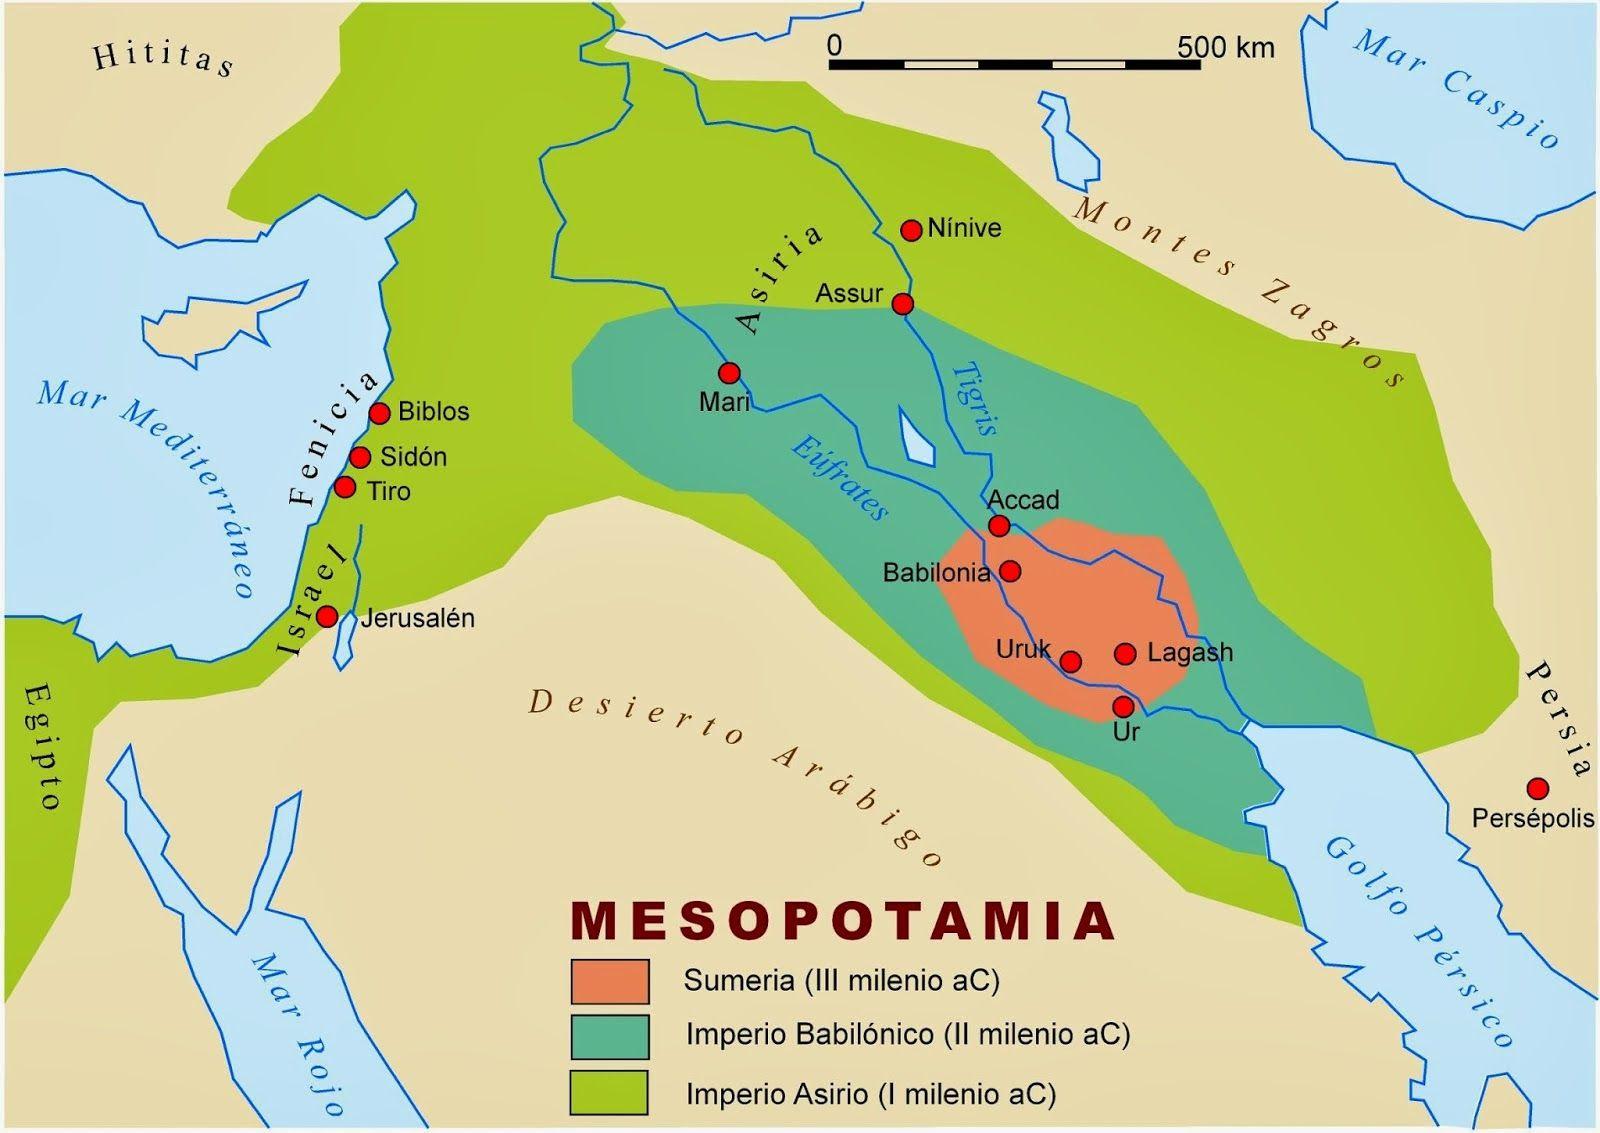 Mapa Conceptual Para 1º Eso De Mesopotamia Buscar Con Google Antigua Mesopotamia Mesopotamia Civilización Sumeria